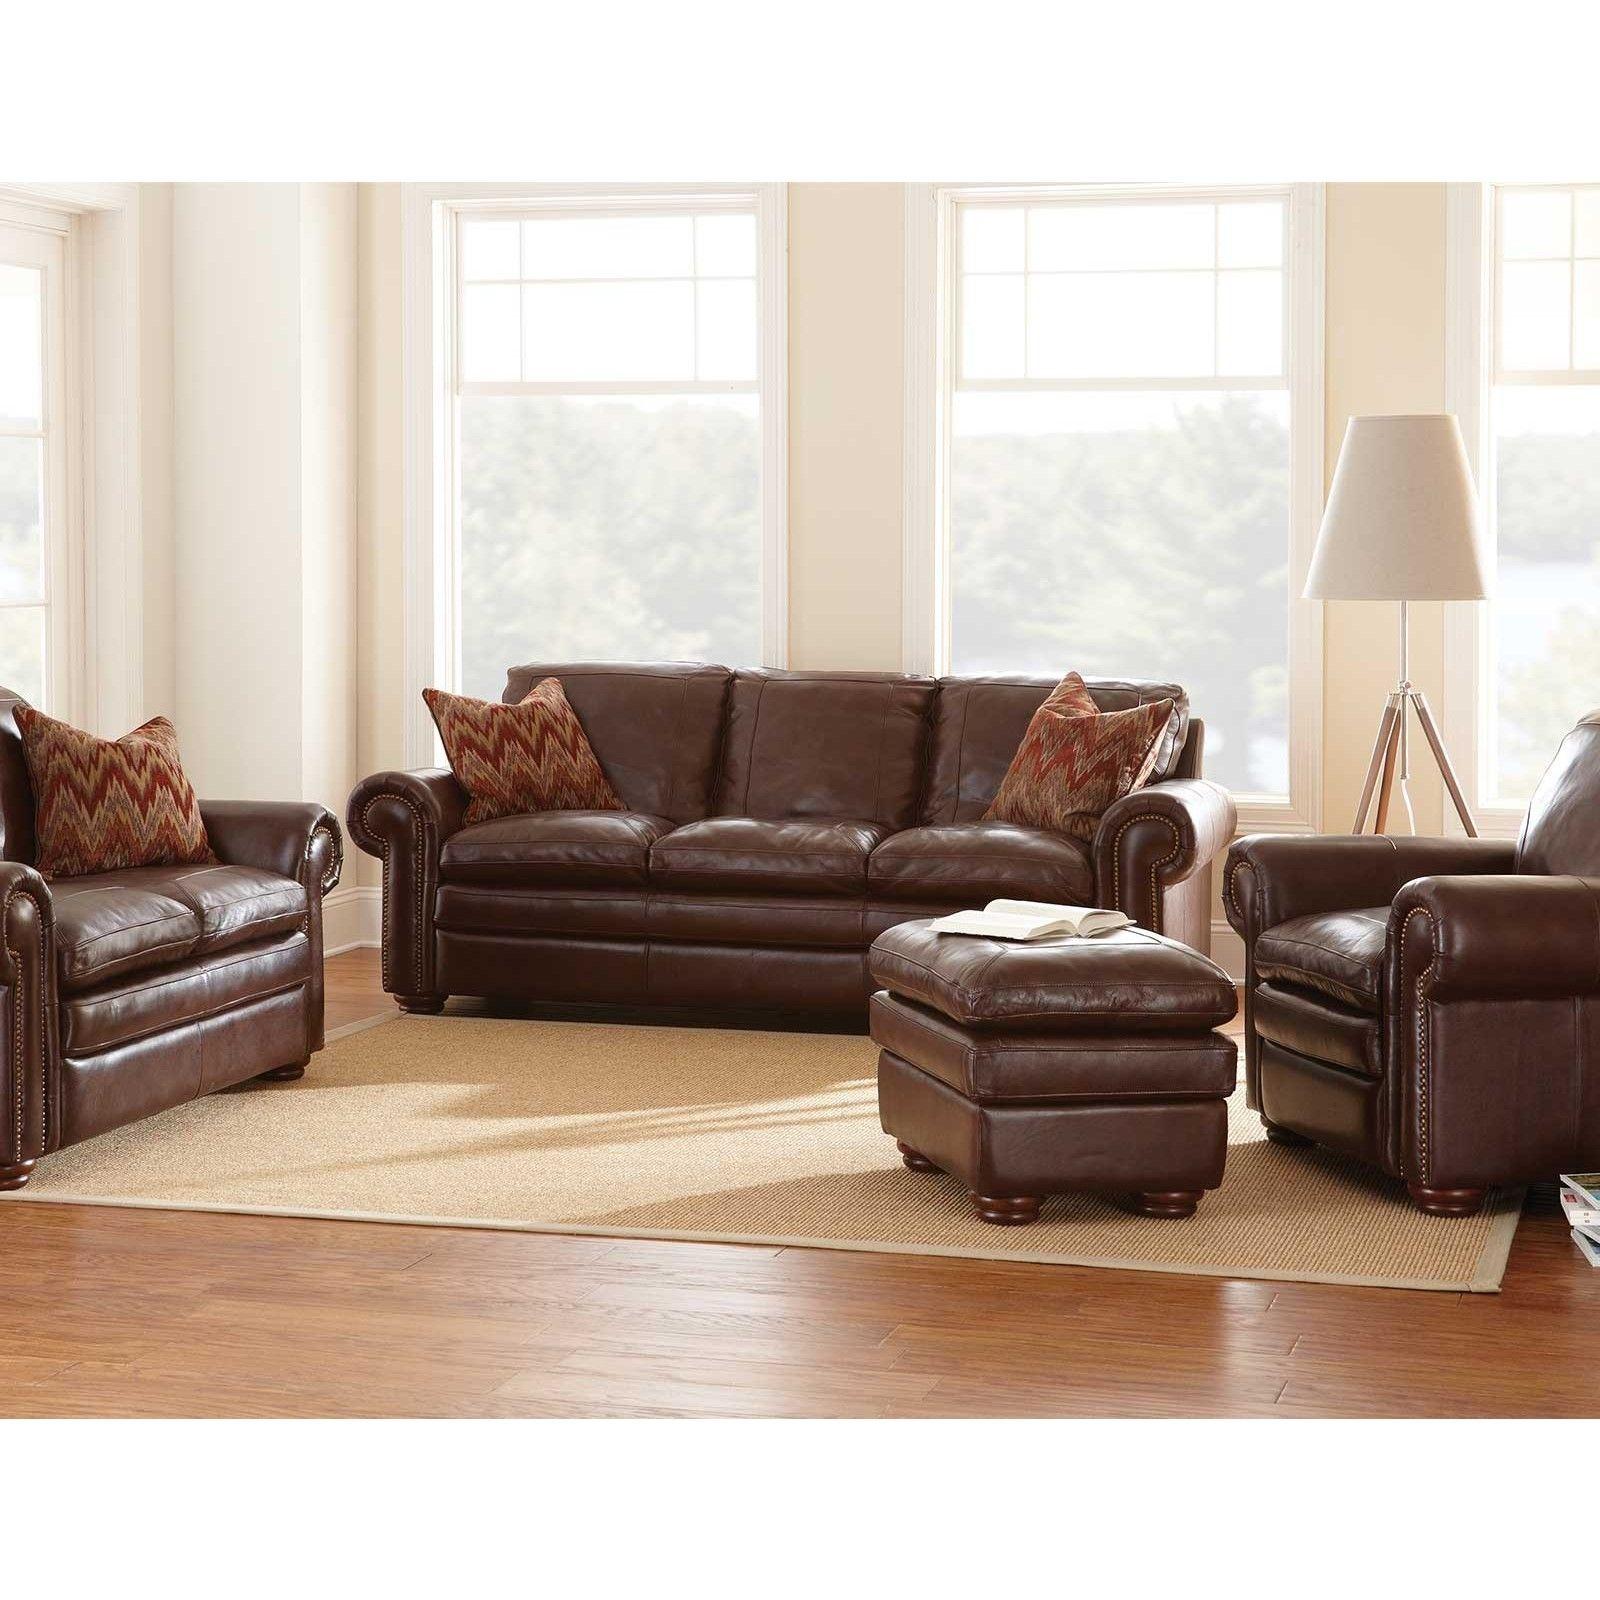 Furniture Living Room Dark Brown Full Grain Leather Sofa Combined